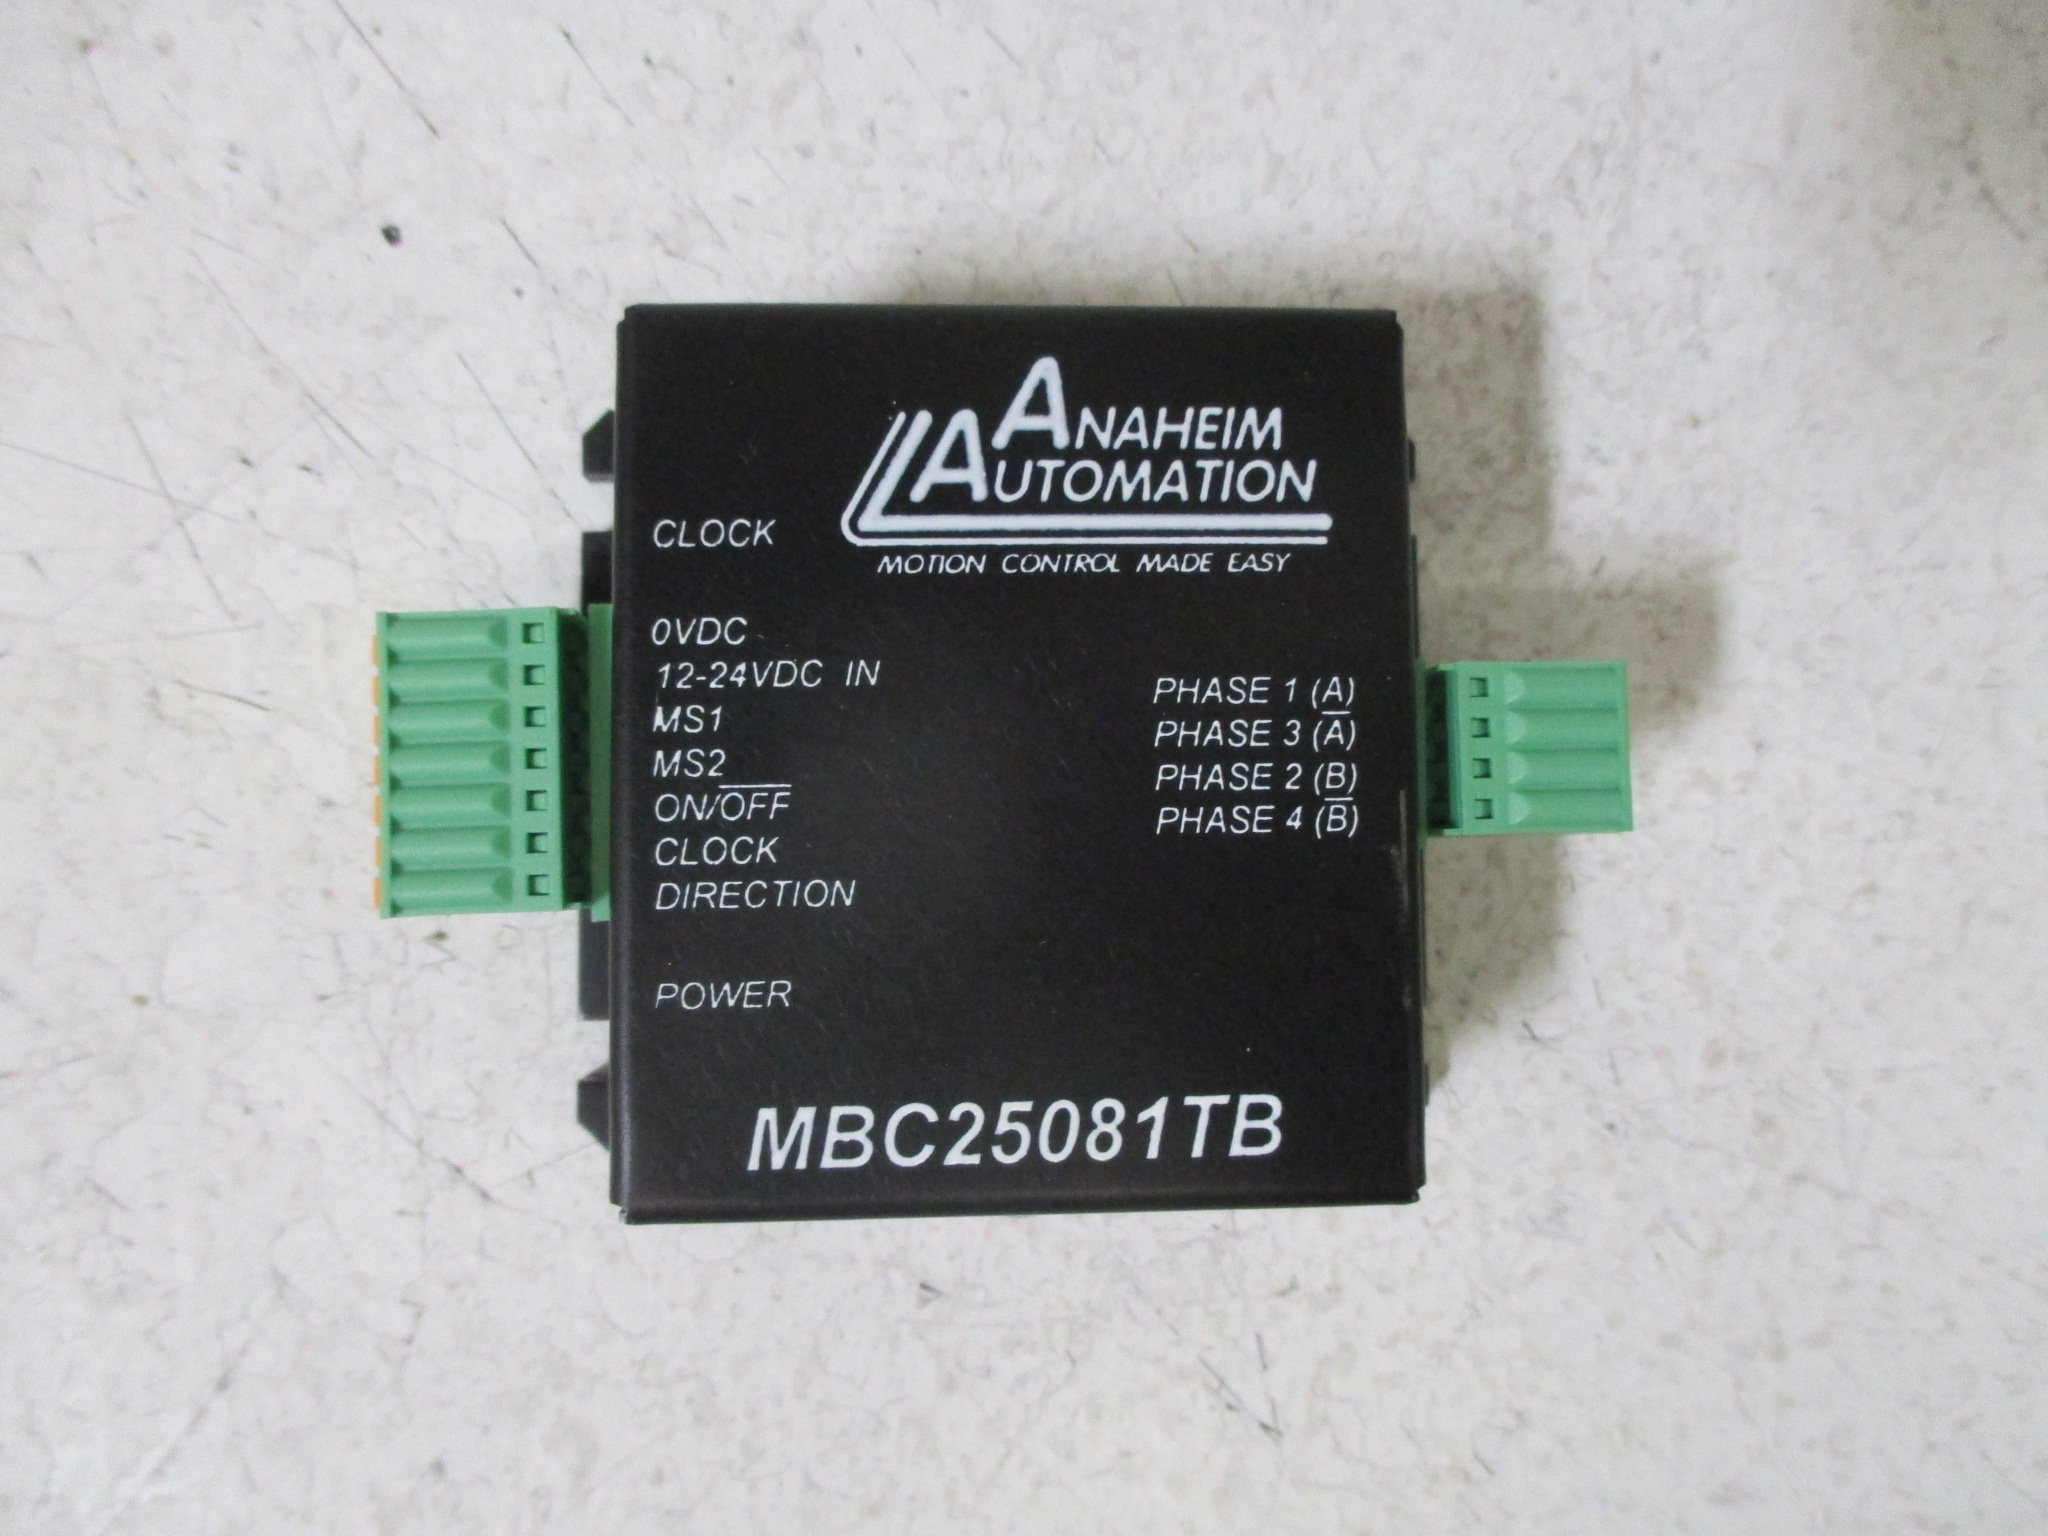 Anaheim Automation MBC25081TB Stepper Driver, Compact Micro Step